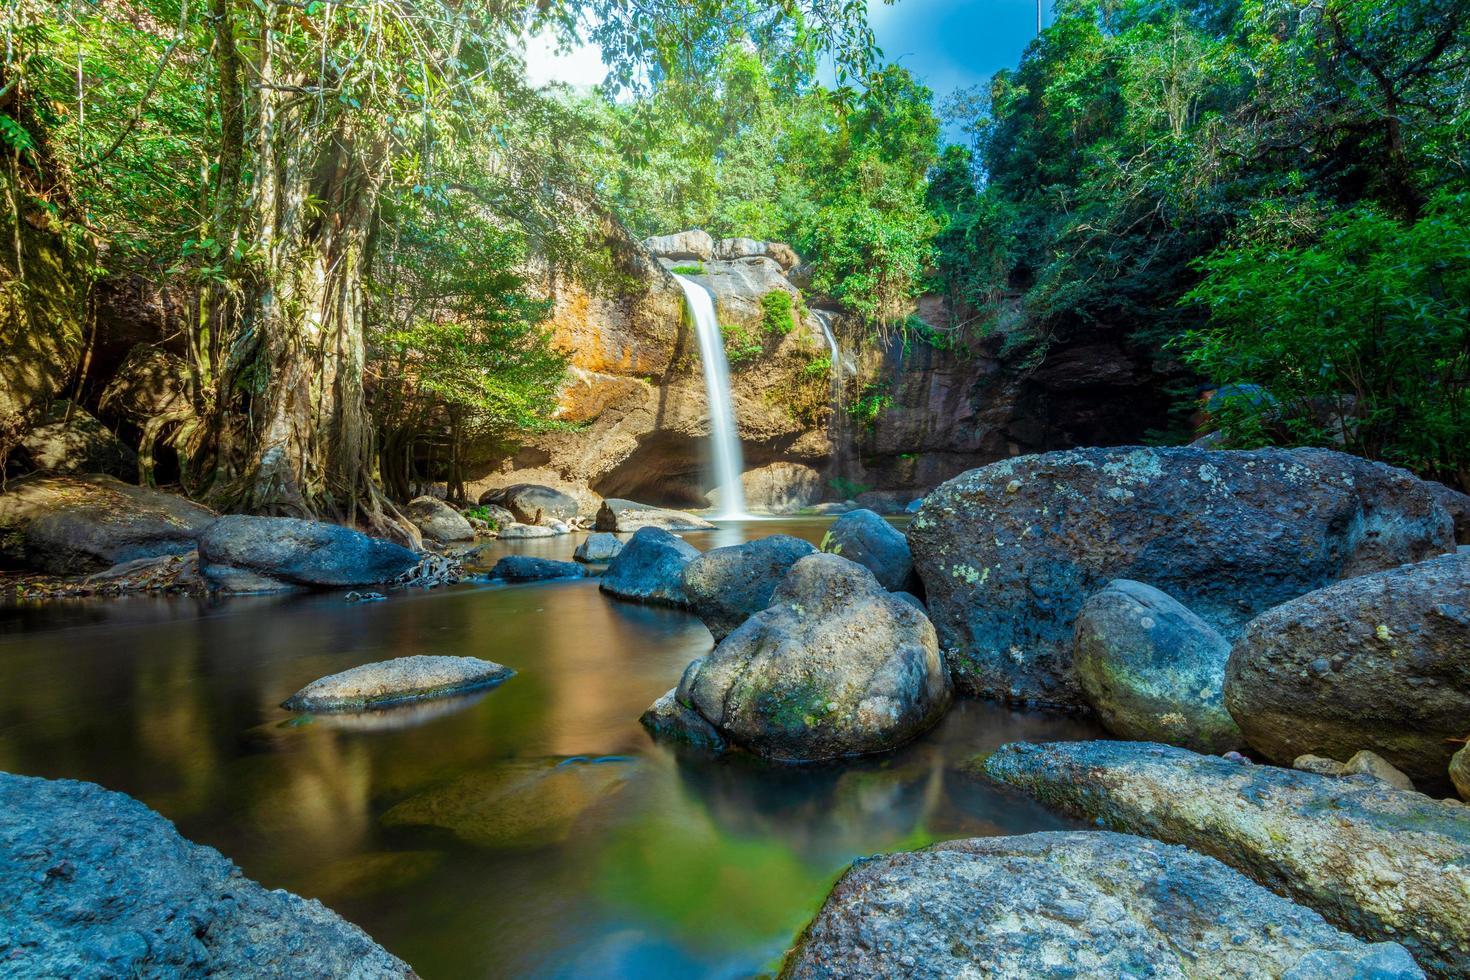 det haew suwat vattenfallet i Thailand foto